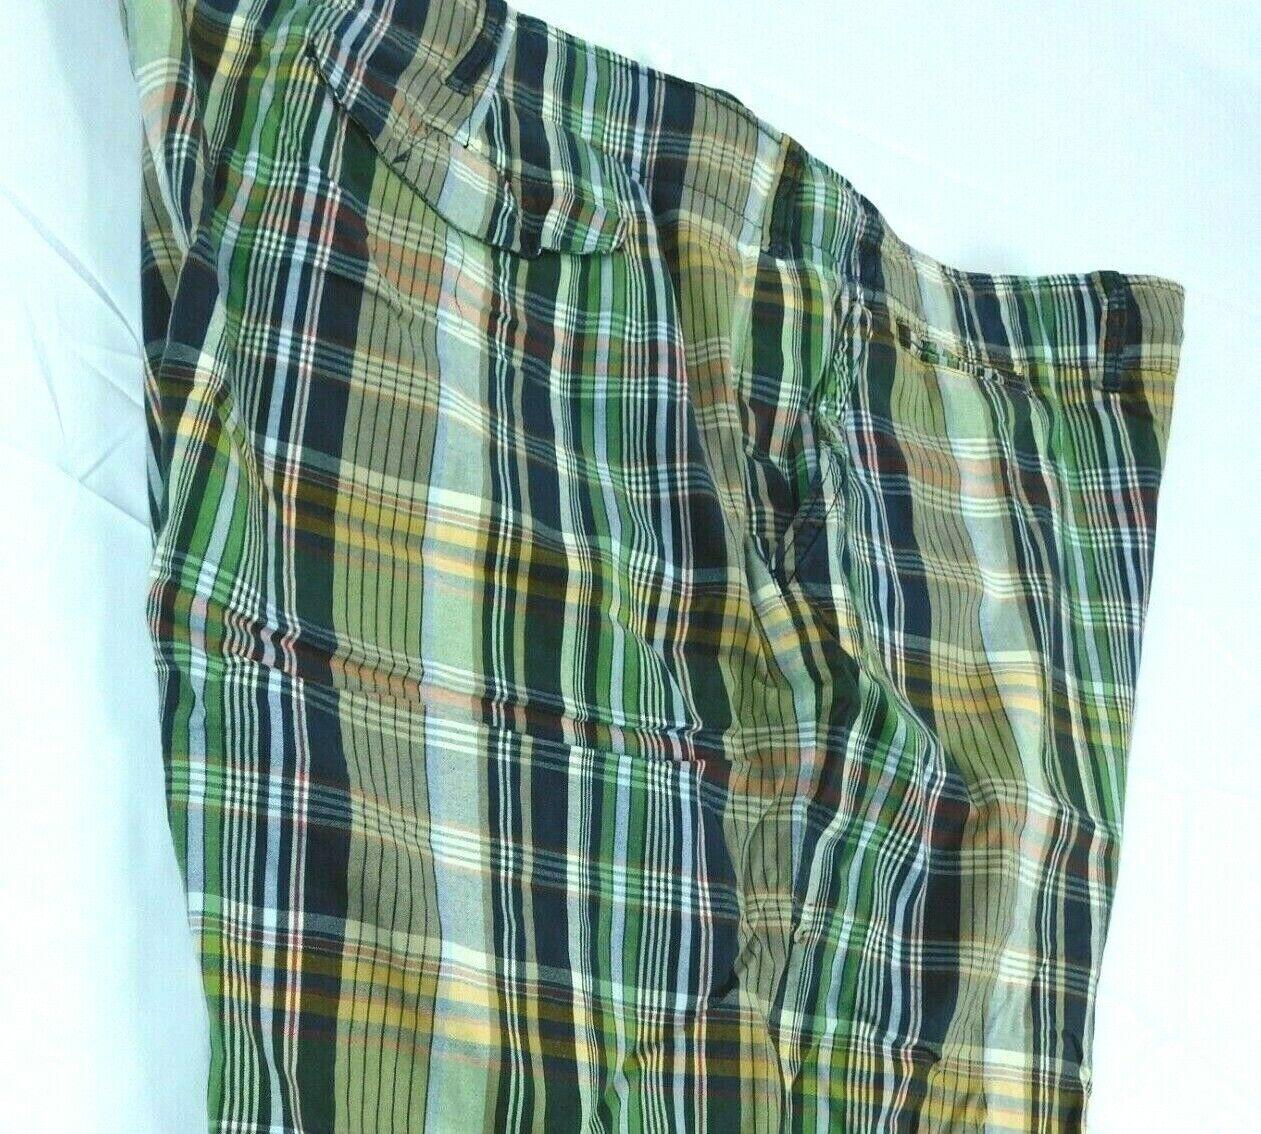 ce532ec9d9db67 Polo Ralph Flat bluee Green Madras Plaid Shorts Sz 48B Drawsting Front  Lauren nryuwb19251-Shorts